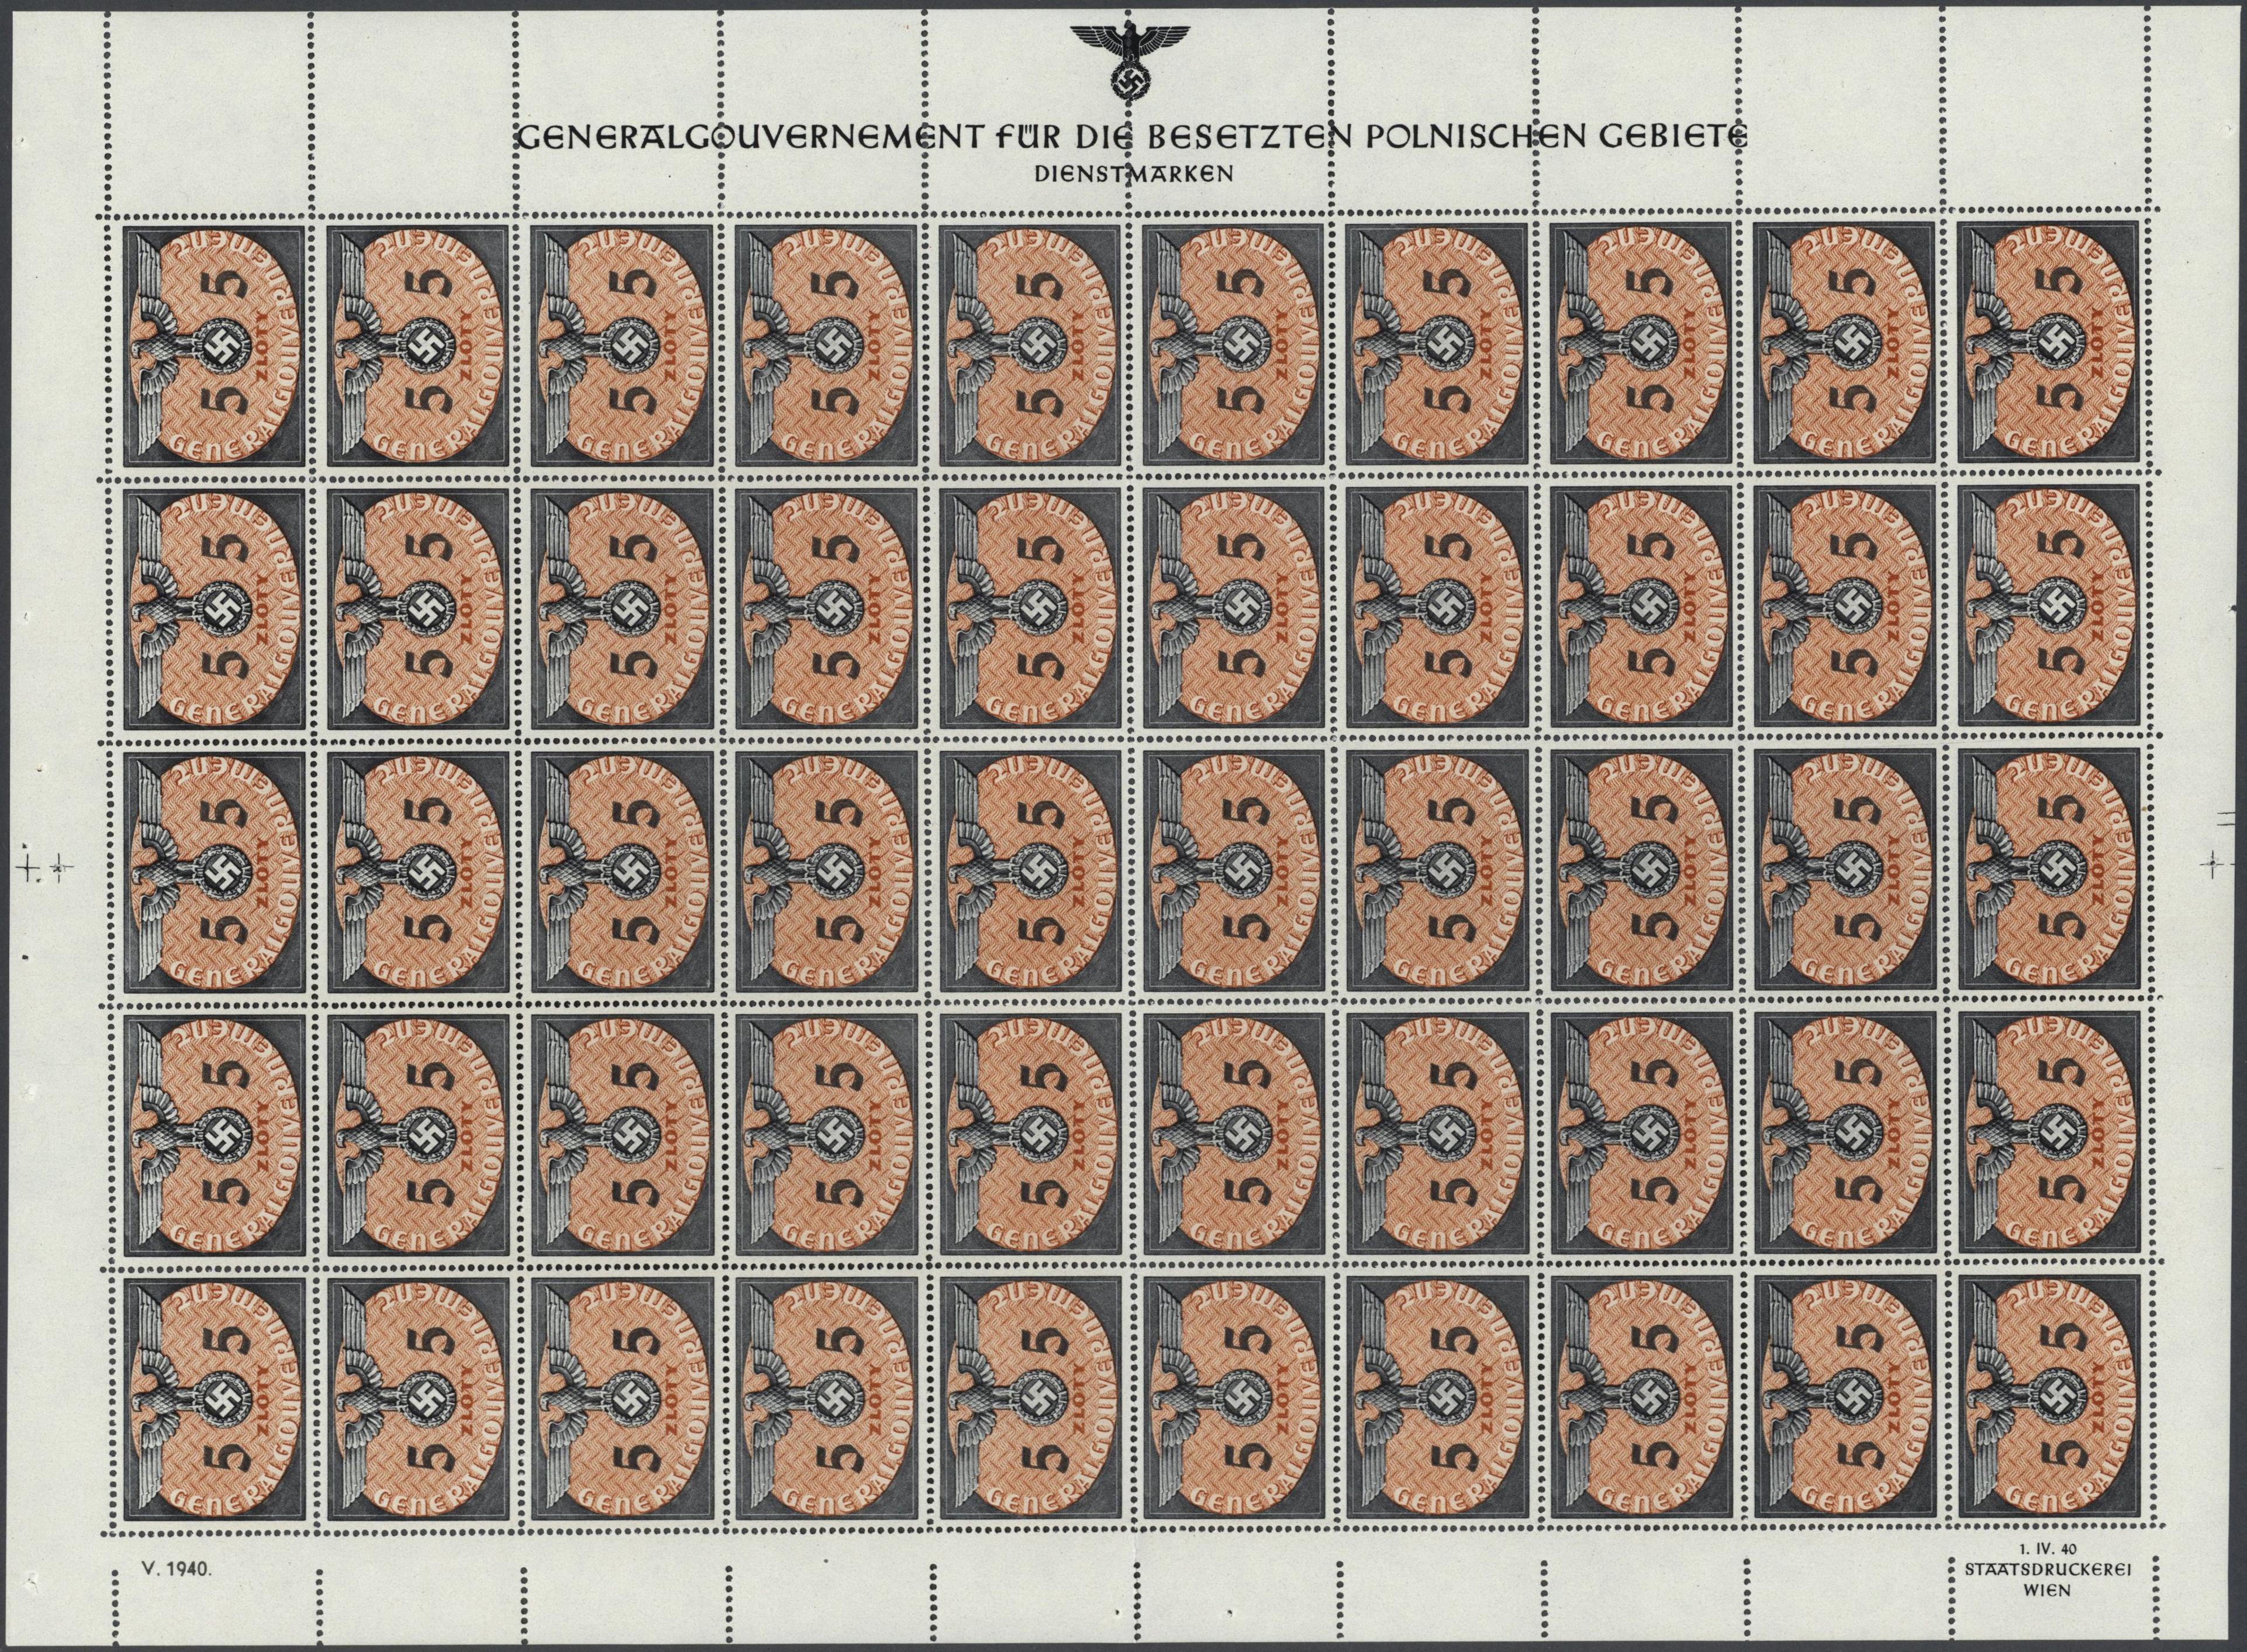 Lot 37107 - Dt. Besetzung II WK - Generalgouvernement - Dienstmarken  -  Auktionshaus Christoph Gärtner GmbH & Co. KG Sale #44 Collections Germany